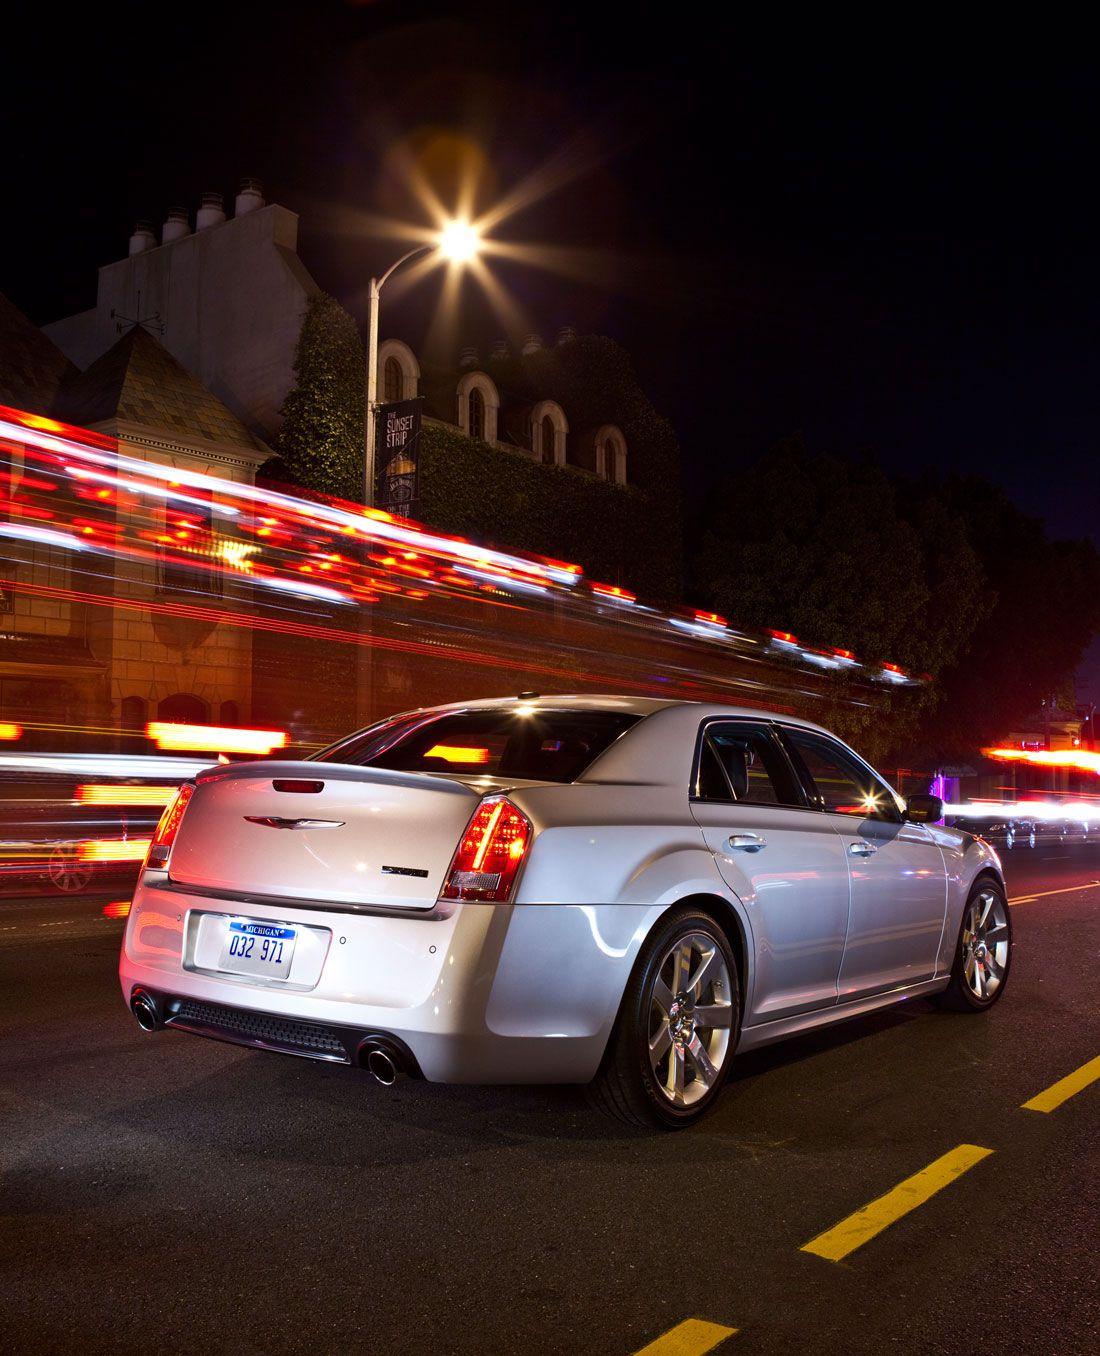 300 Srt8 Meet Mr Bentley On: 2013 #Chrysler #300 SRT8 Http://www.tallahasseedcj.com/new